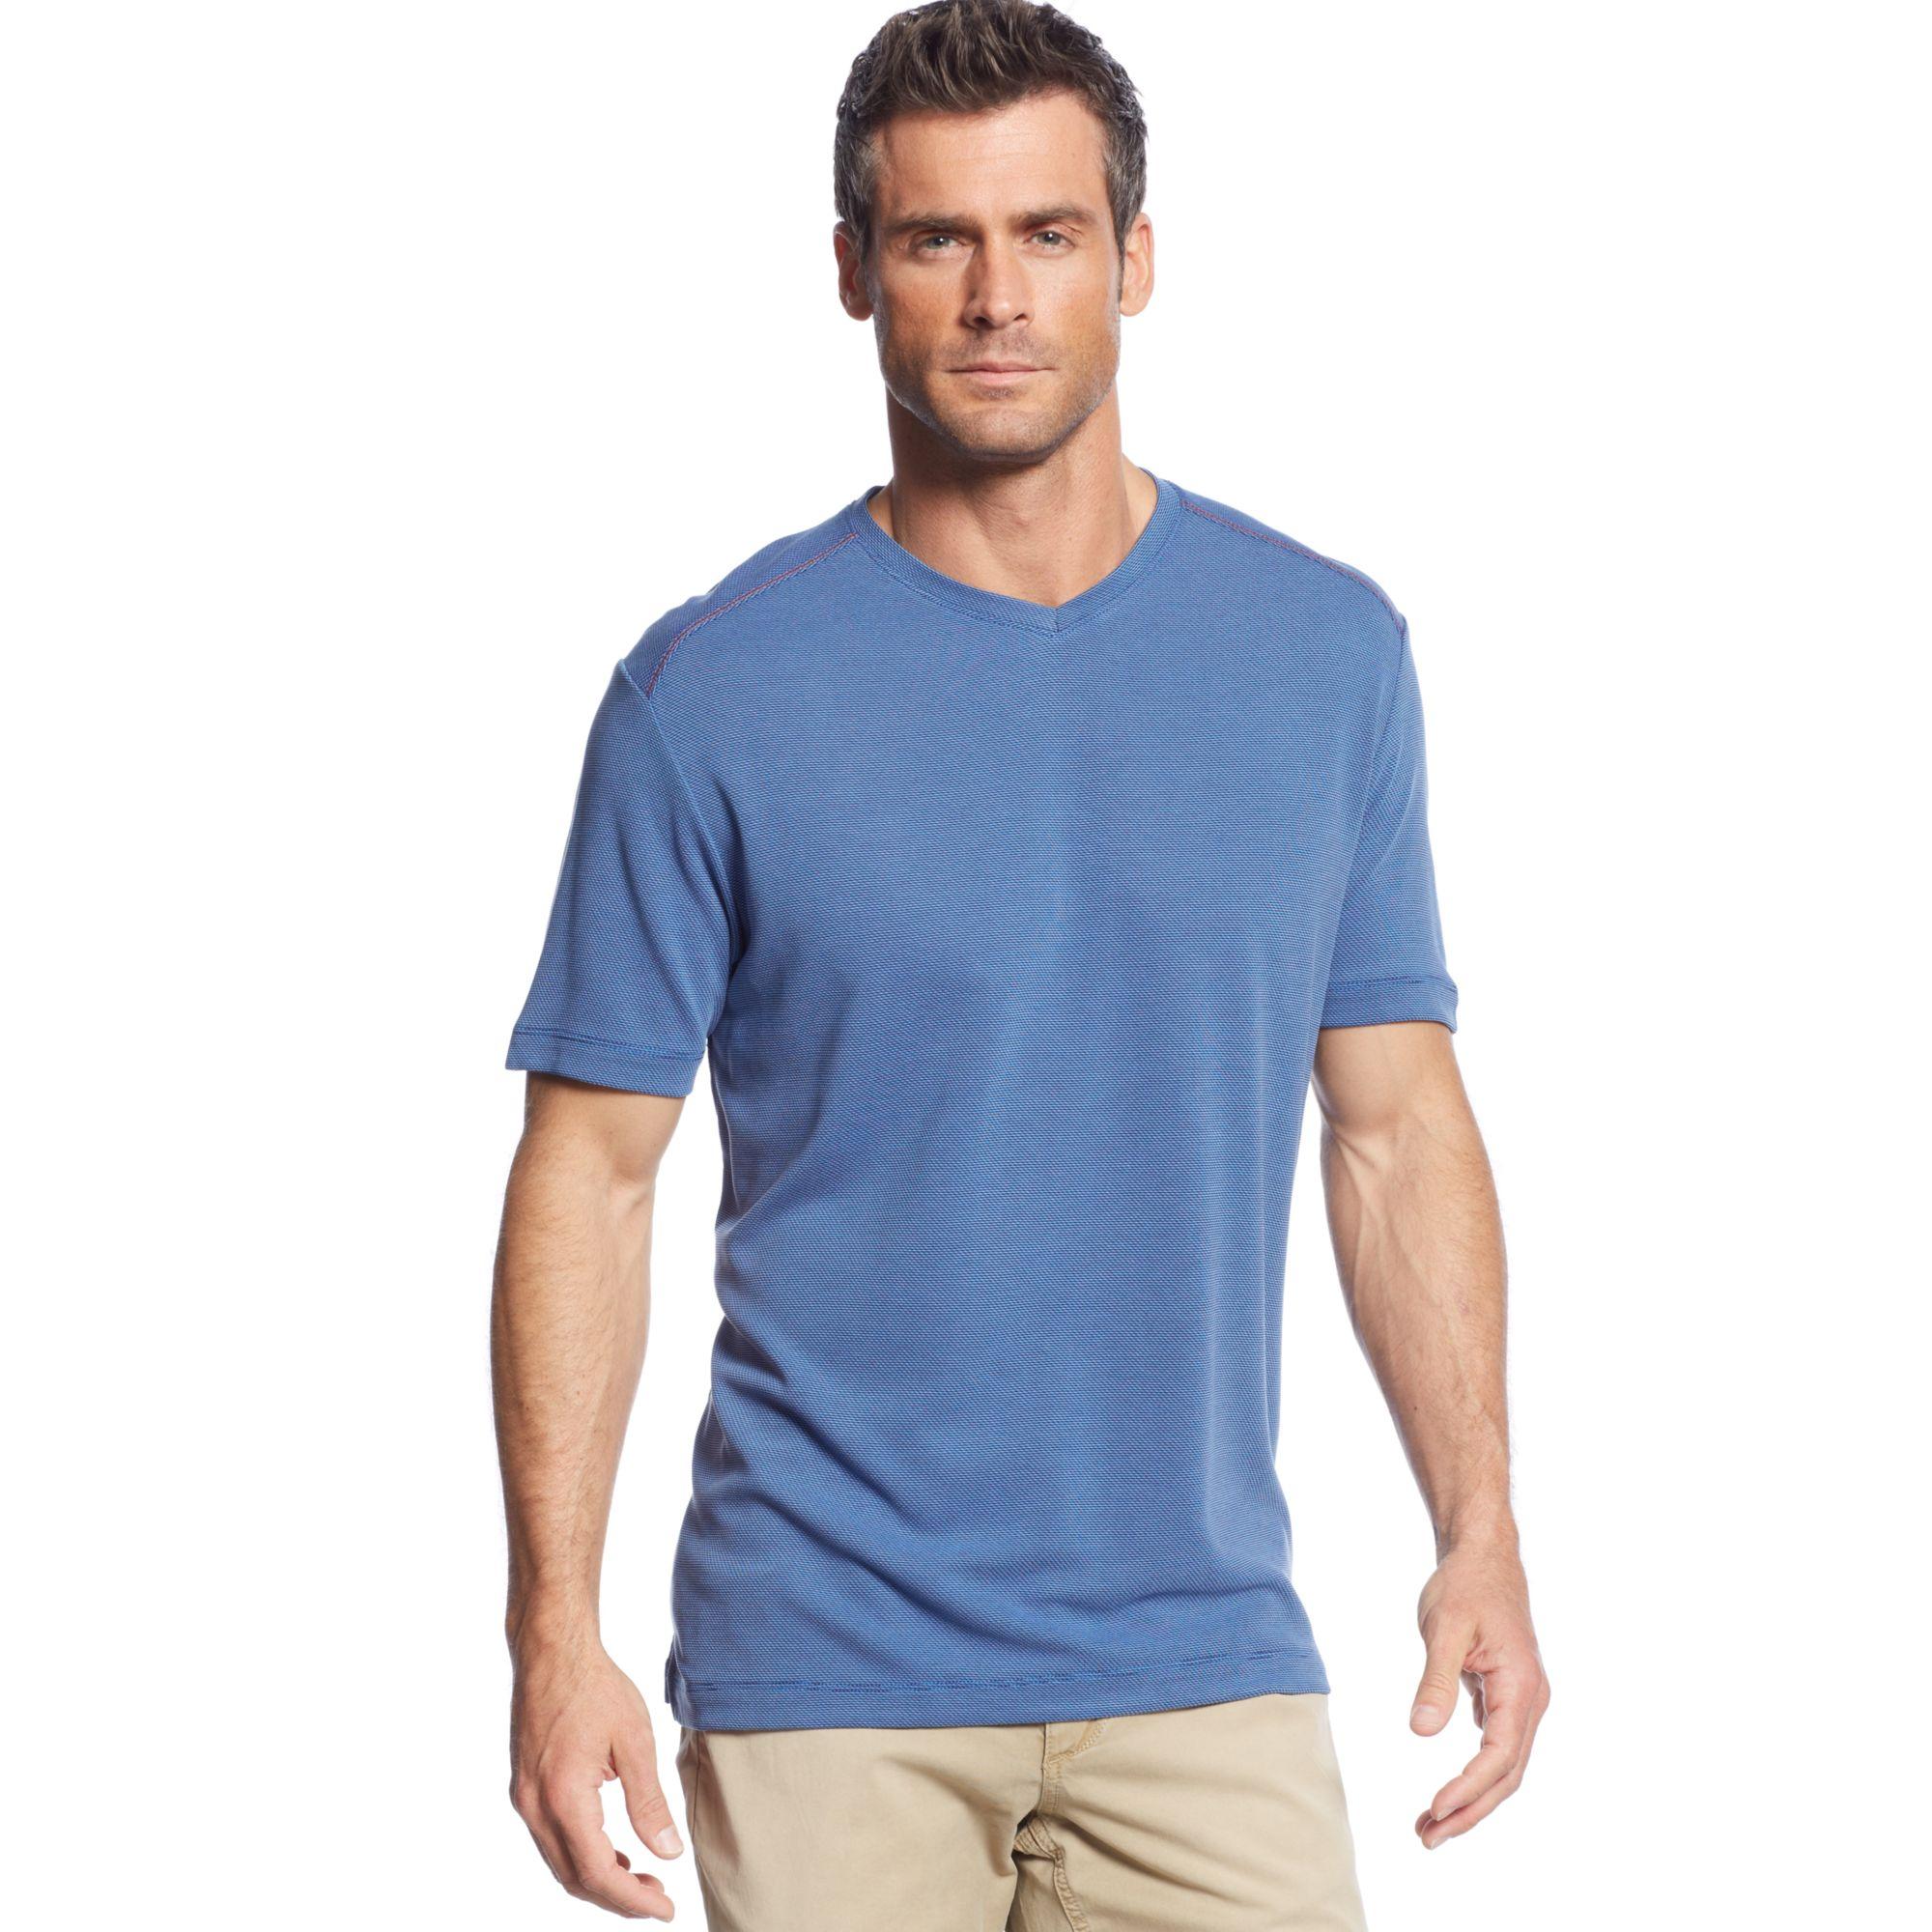 Tommy Bahama Pebble Shore Vneck Tshirt In Blue For Men